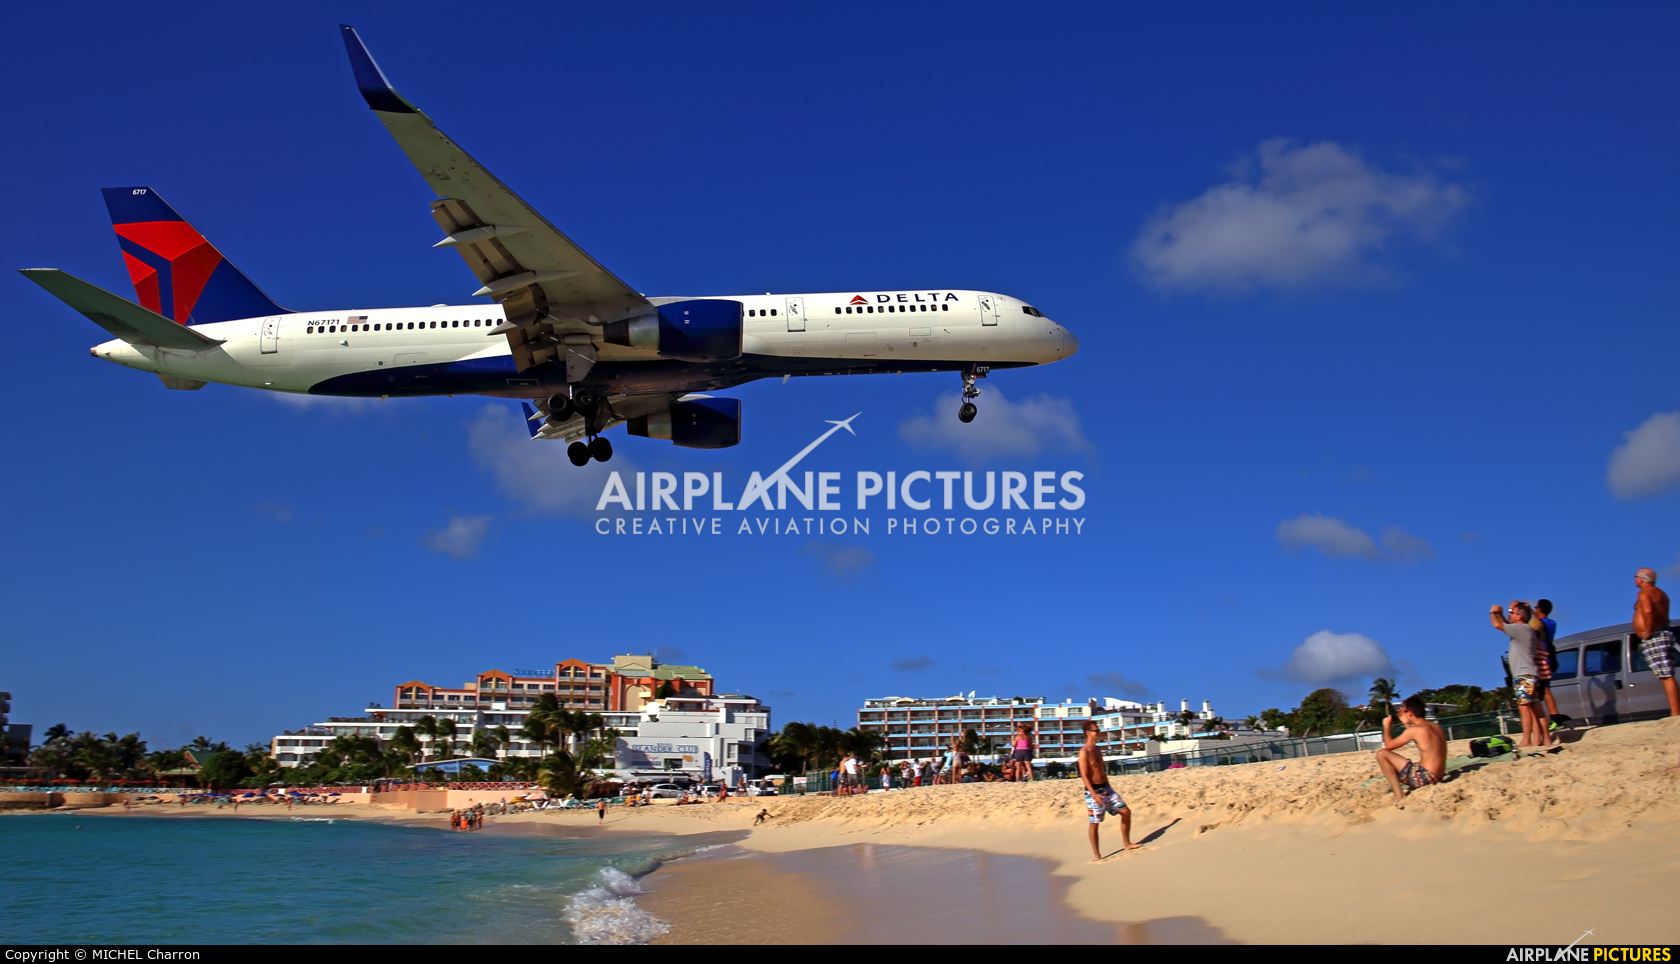 Delta Air Lines N67171 aircraft at Sint Maarten - Princess Juliana Intl